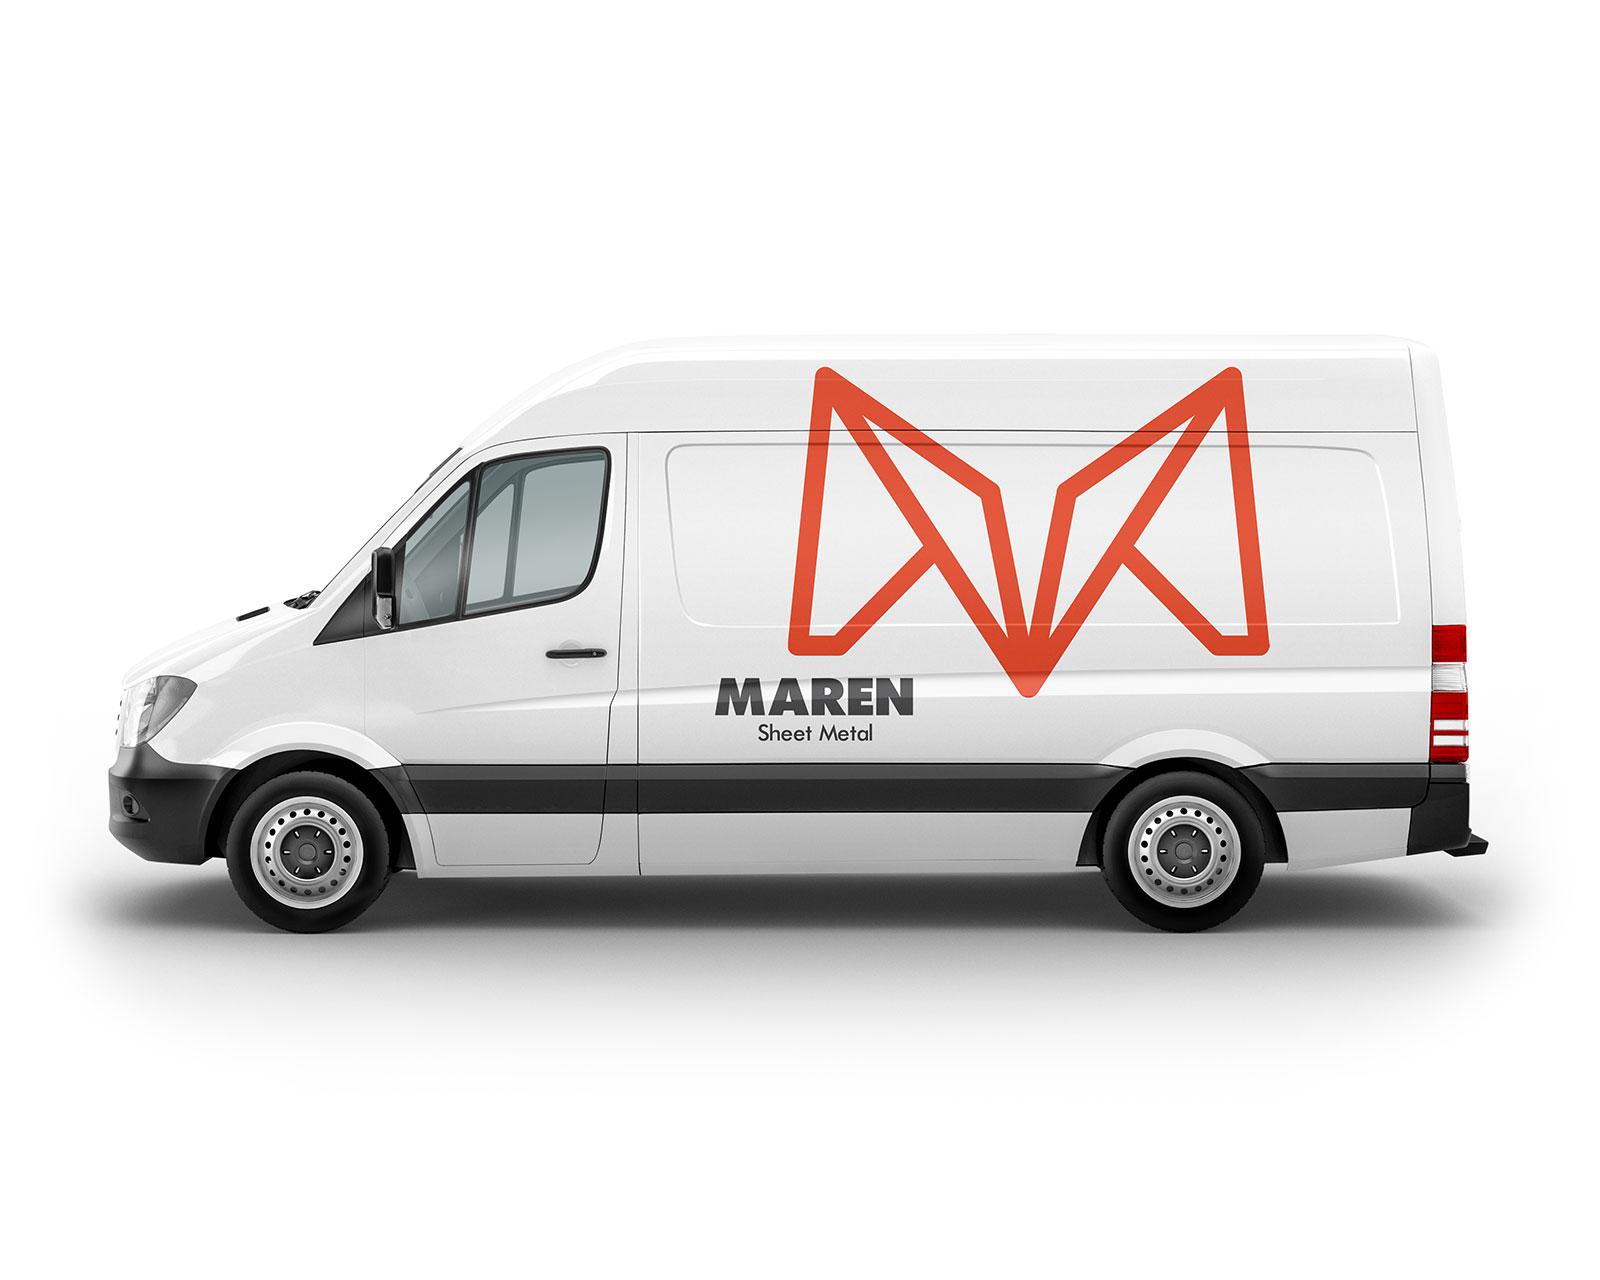 Final logo placement on work van